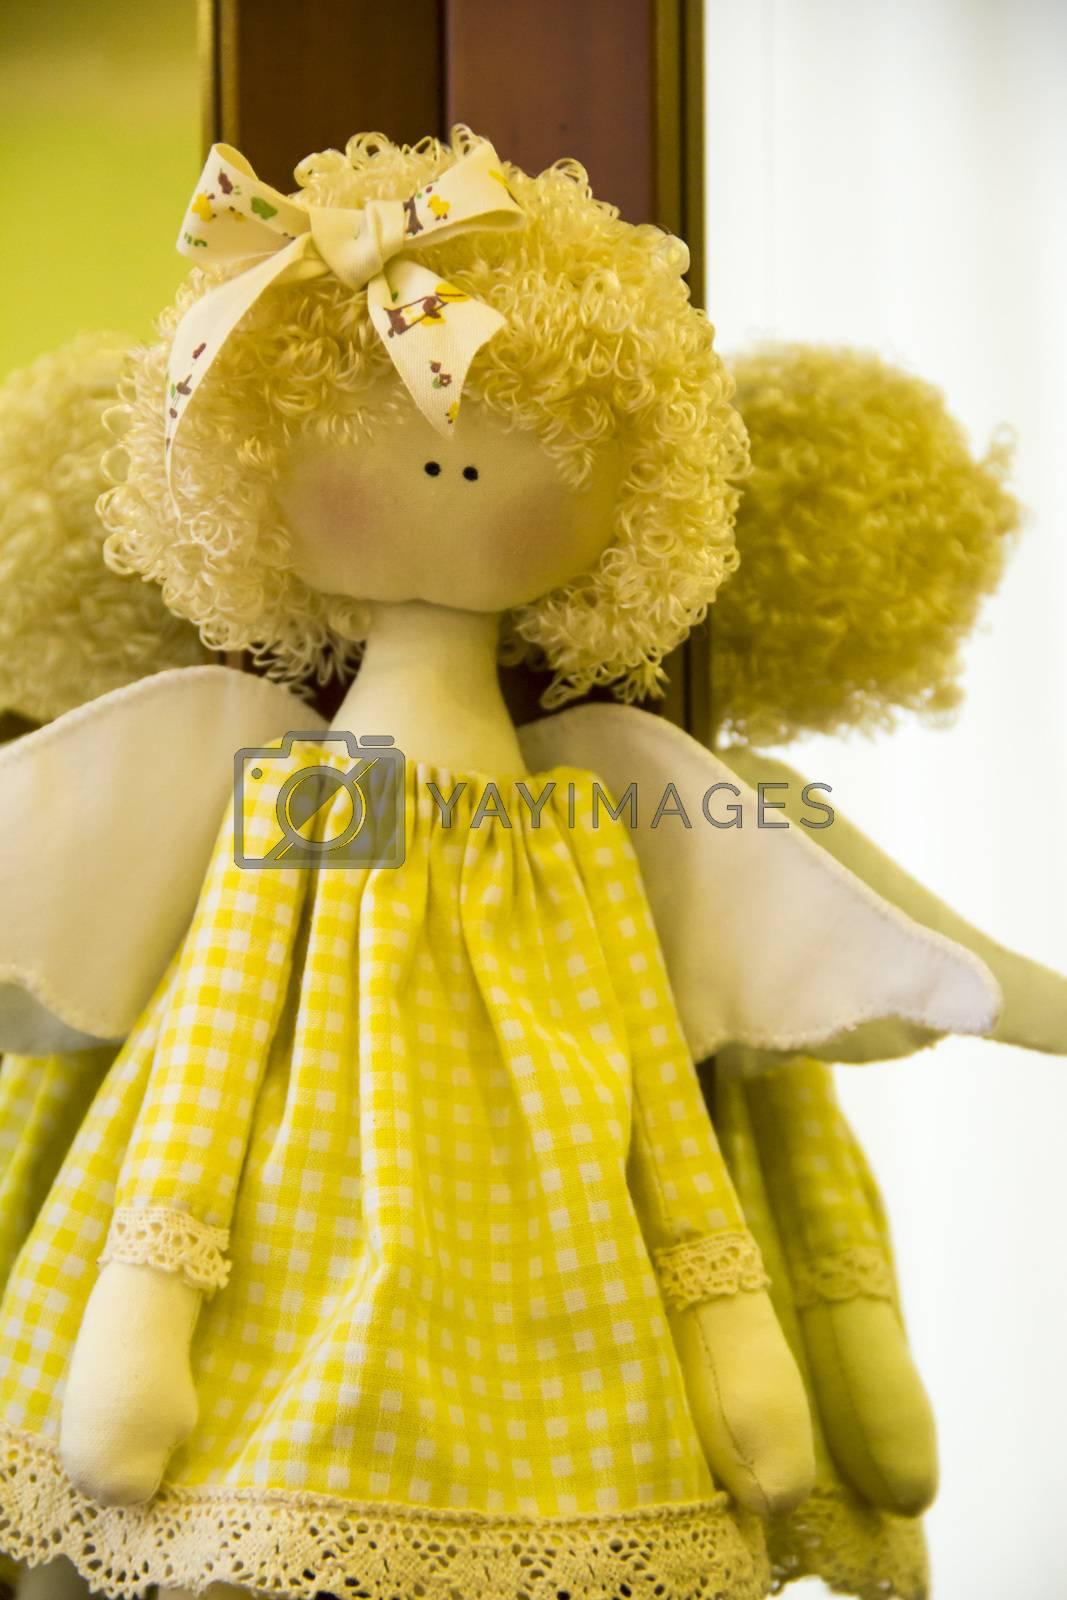 Royalty free image of doll angell by Irinavk